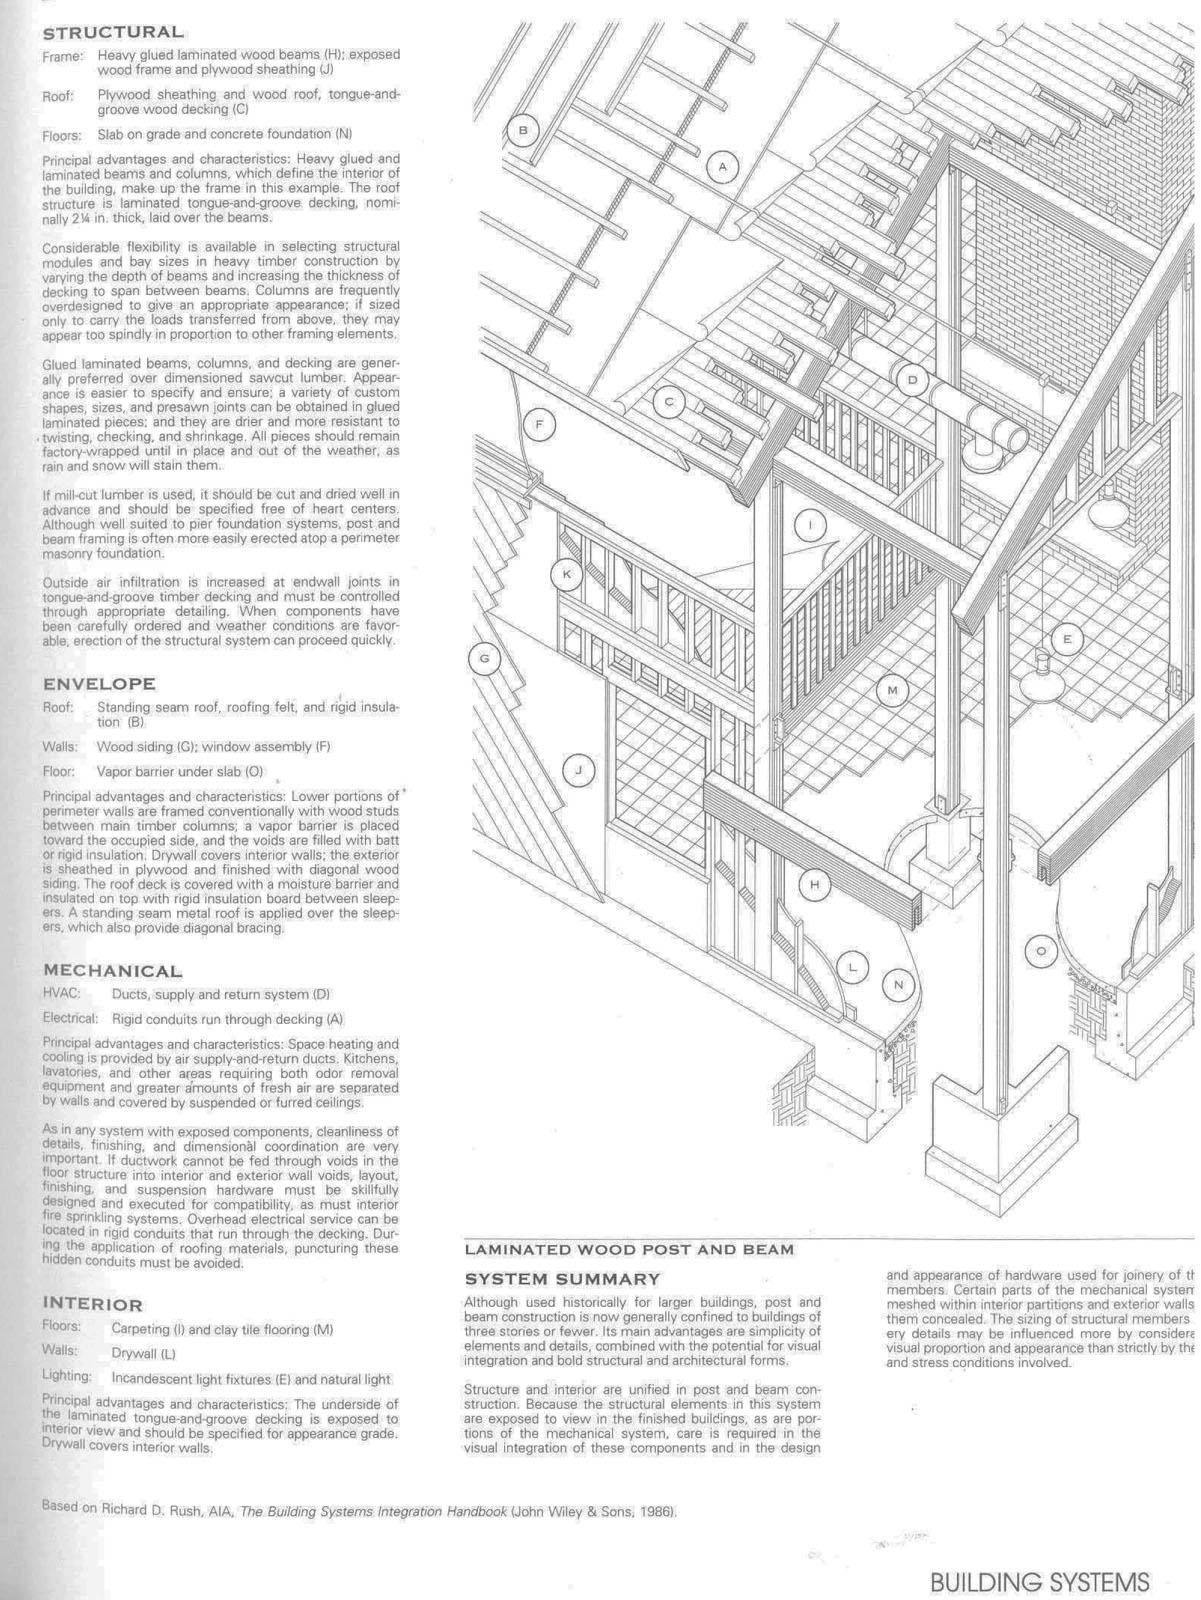 Interior graphic standards review interior graphic and - Interior graphic and design standards ...